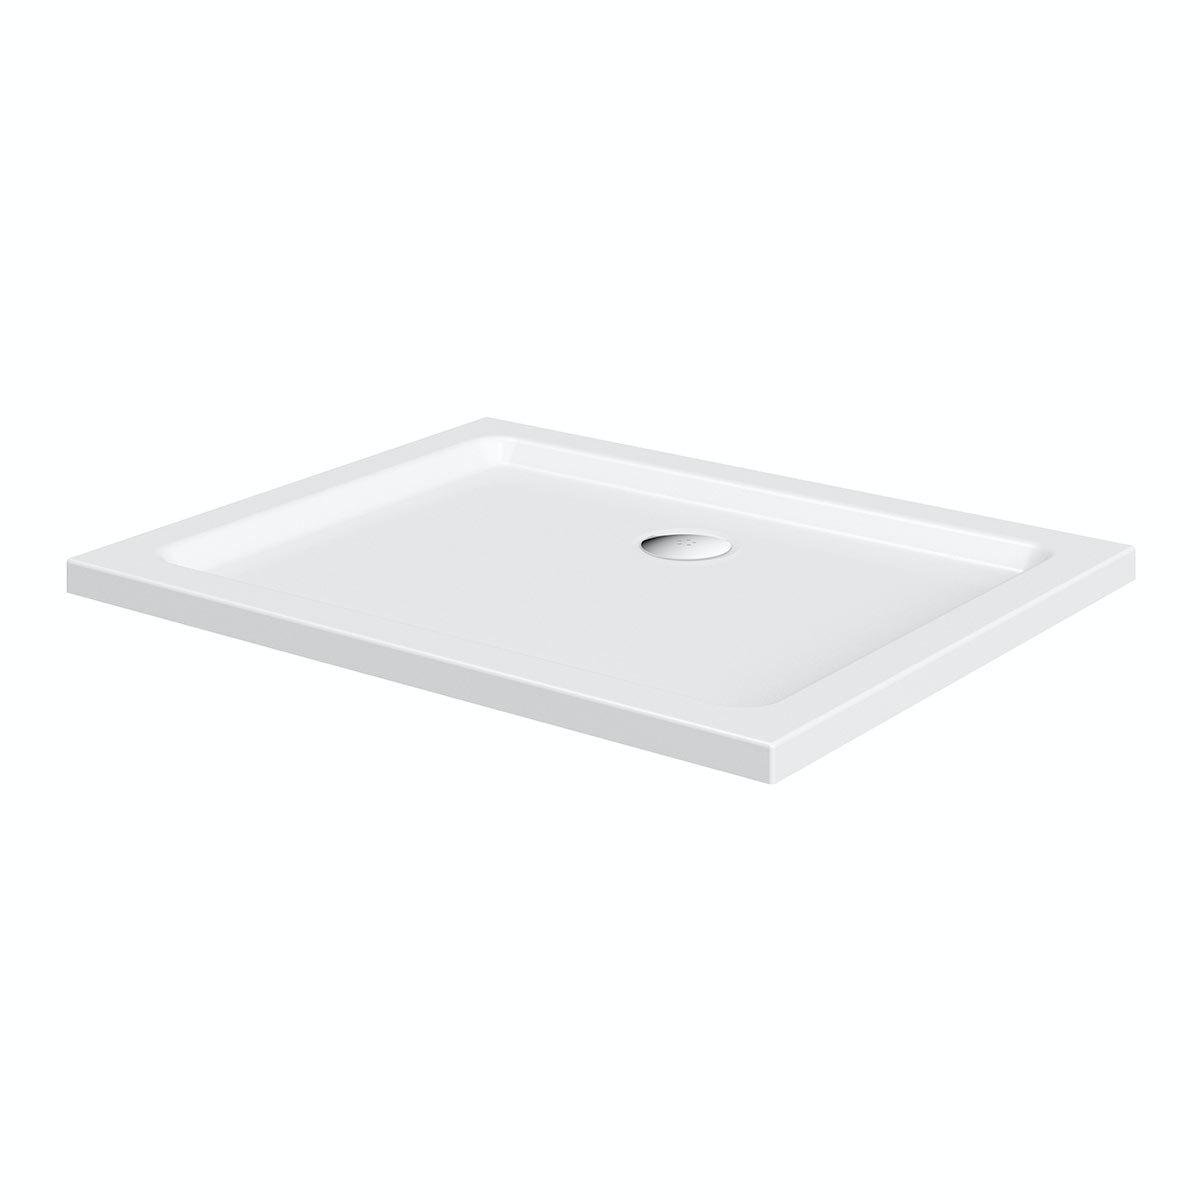 Simplite Rectangular Shower Tray